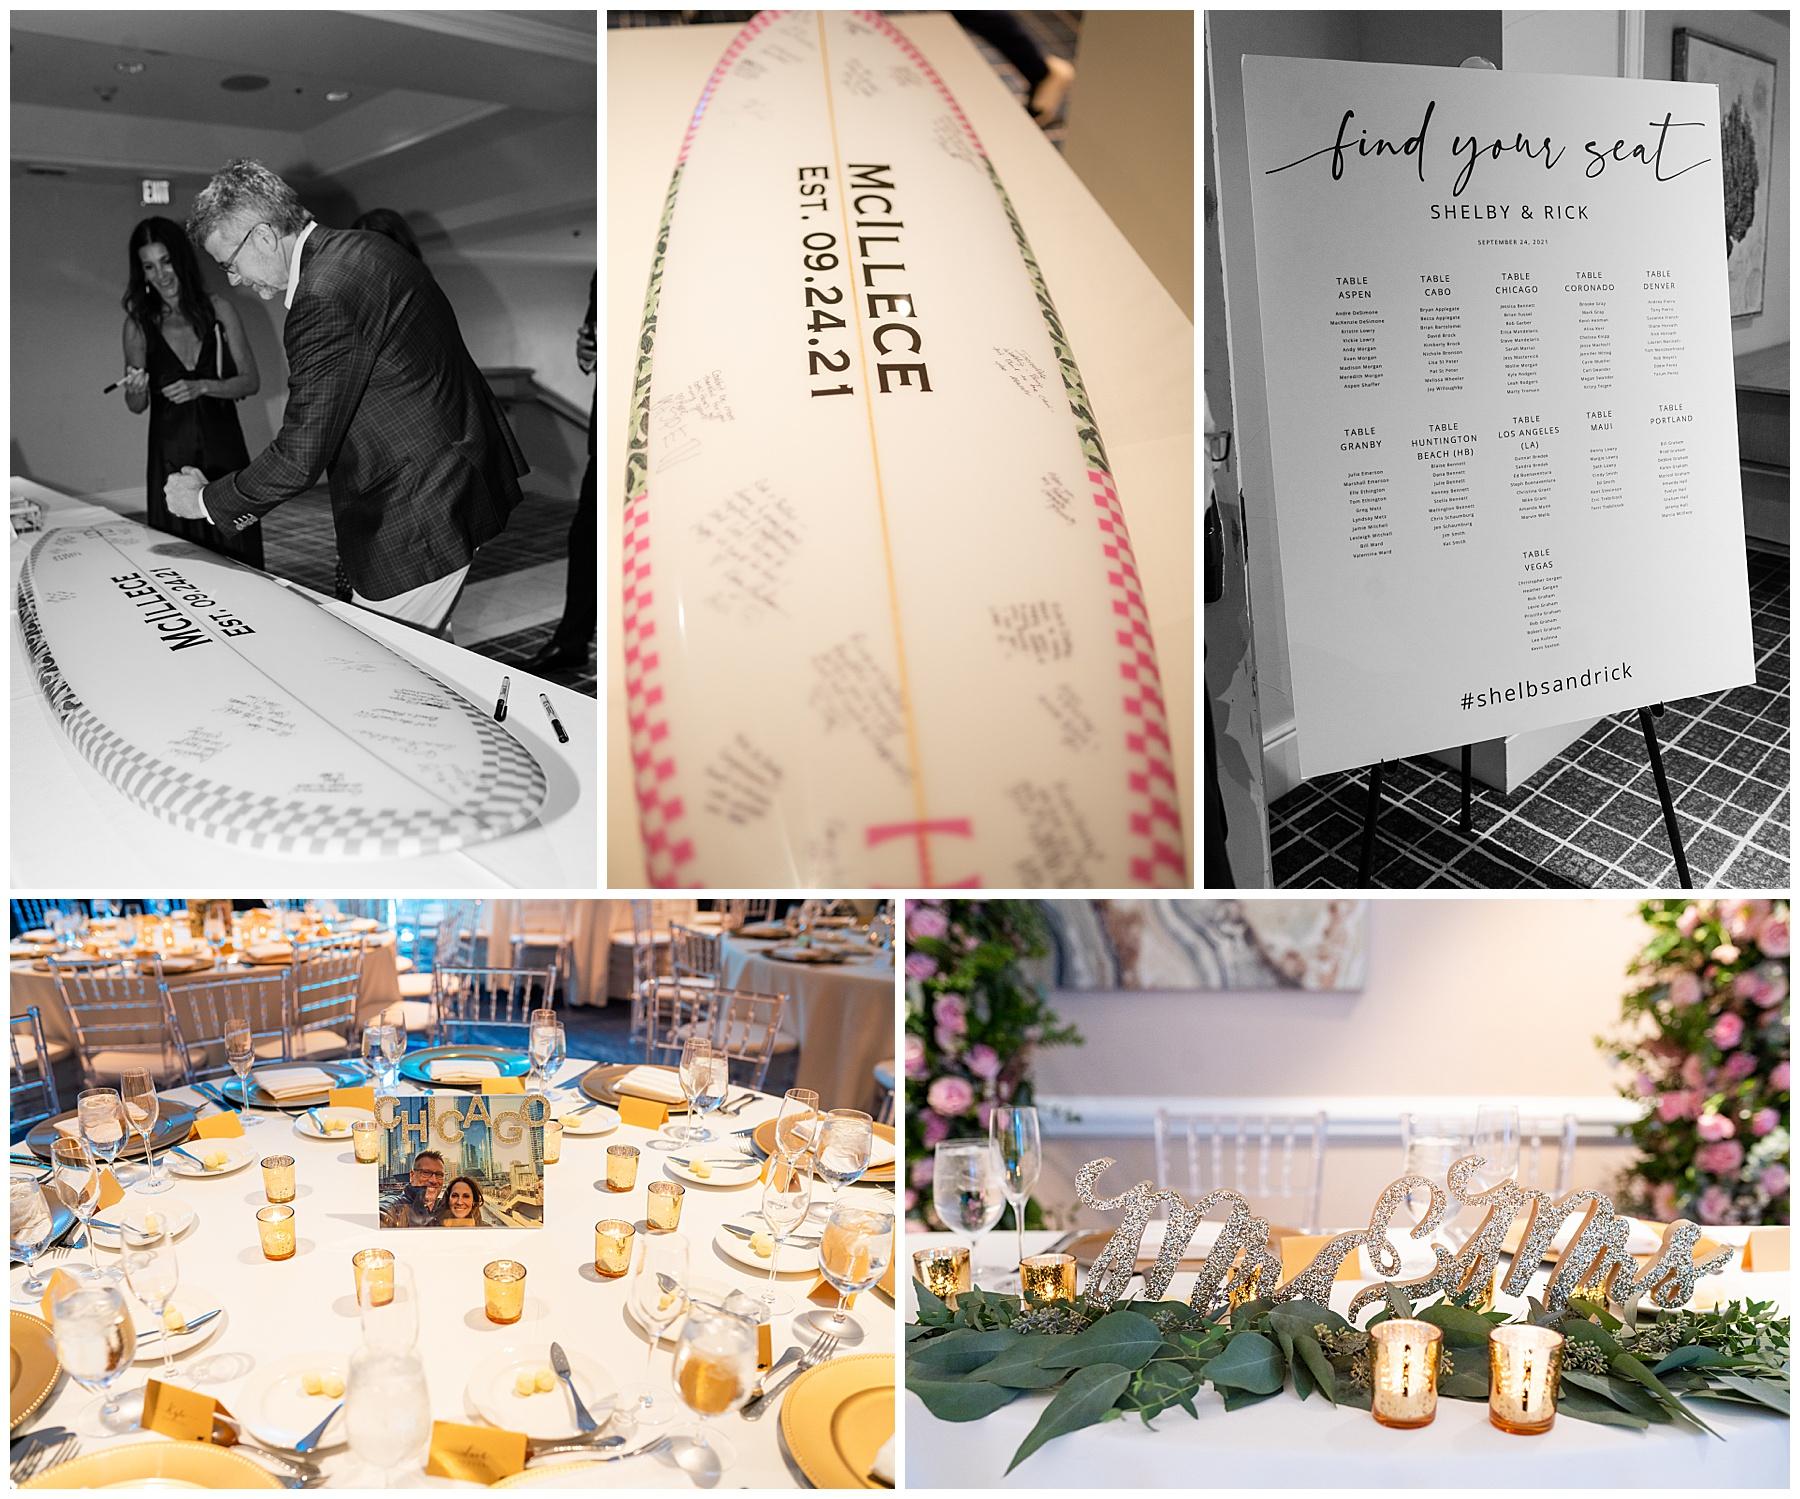 surfboard wedding guest sign